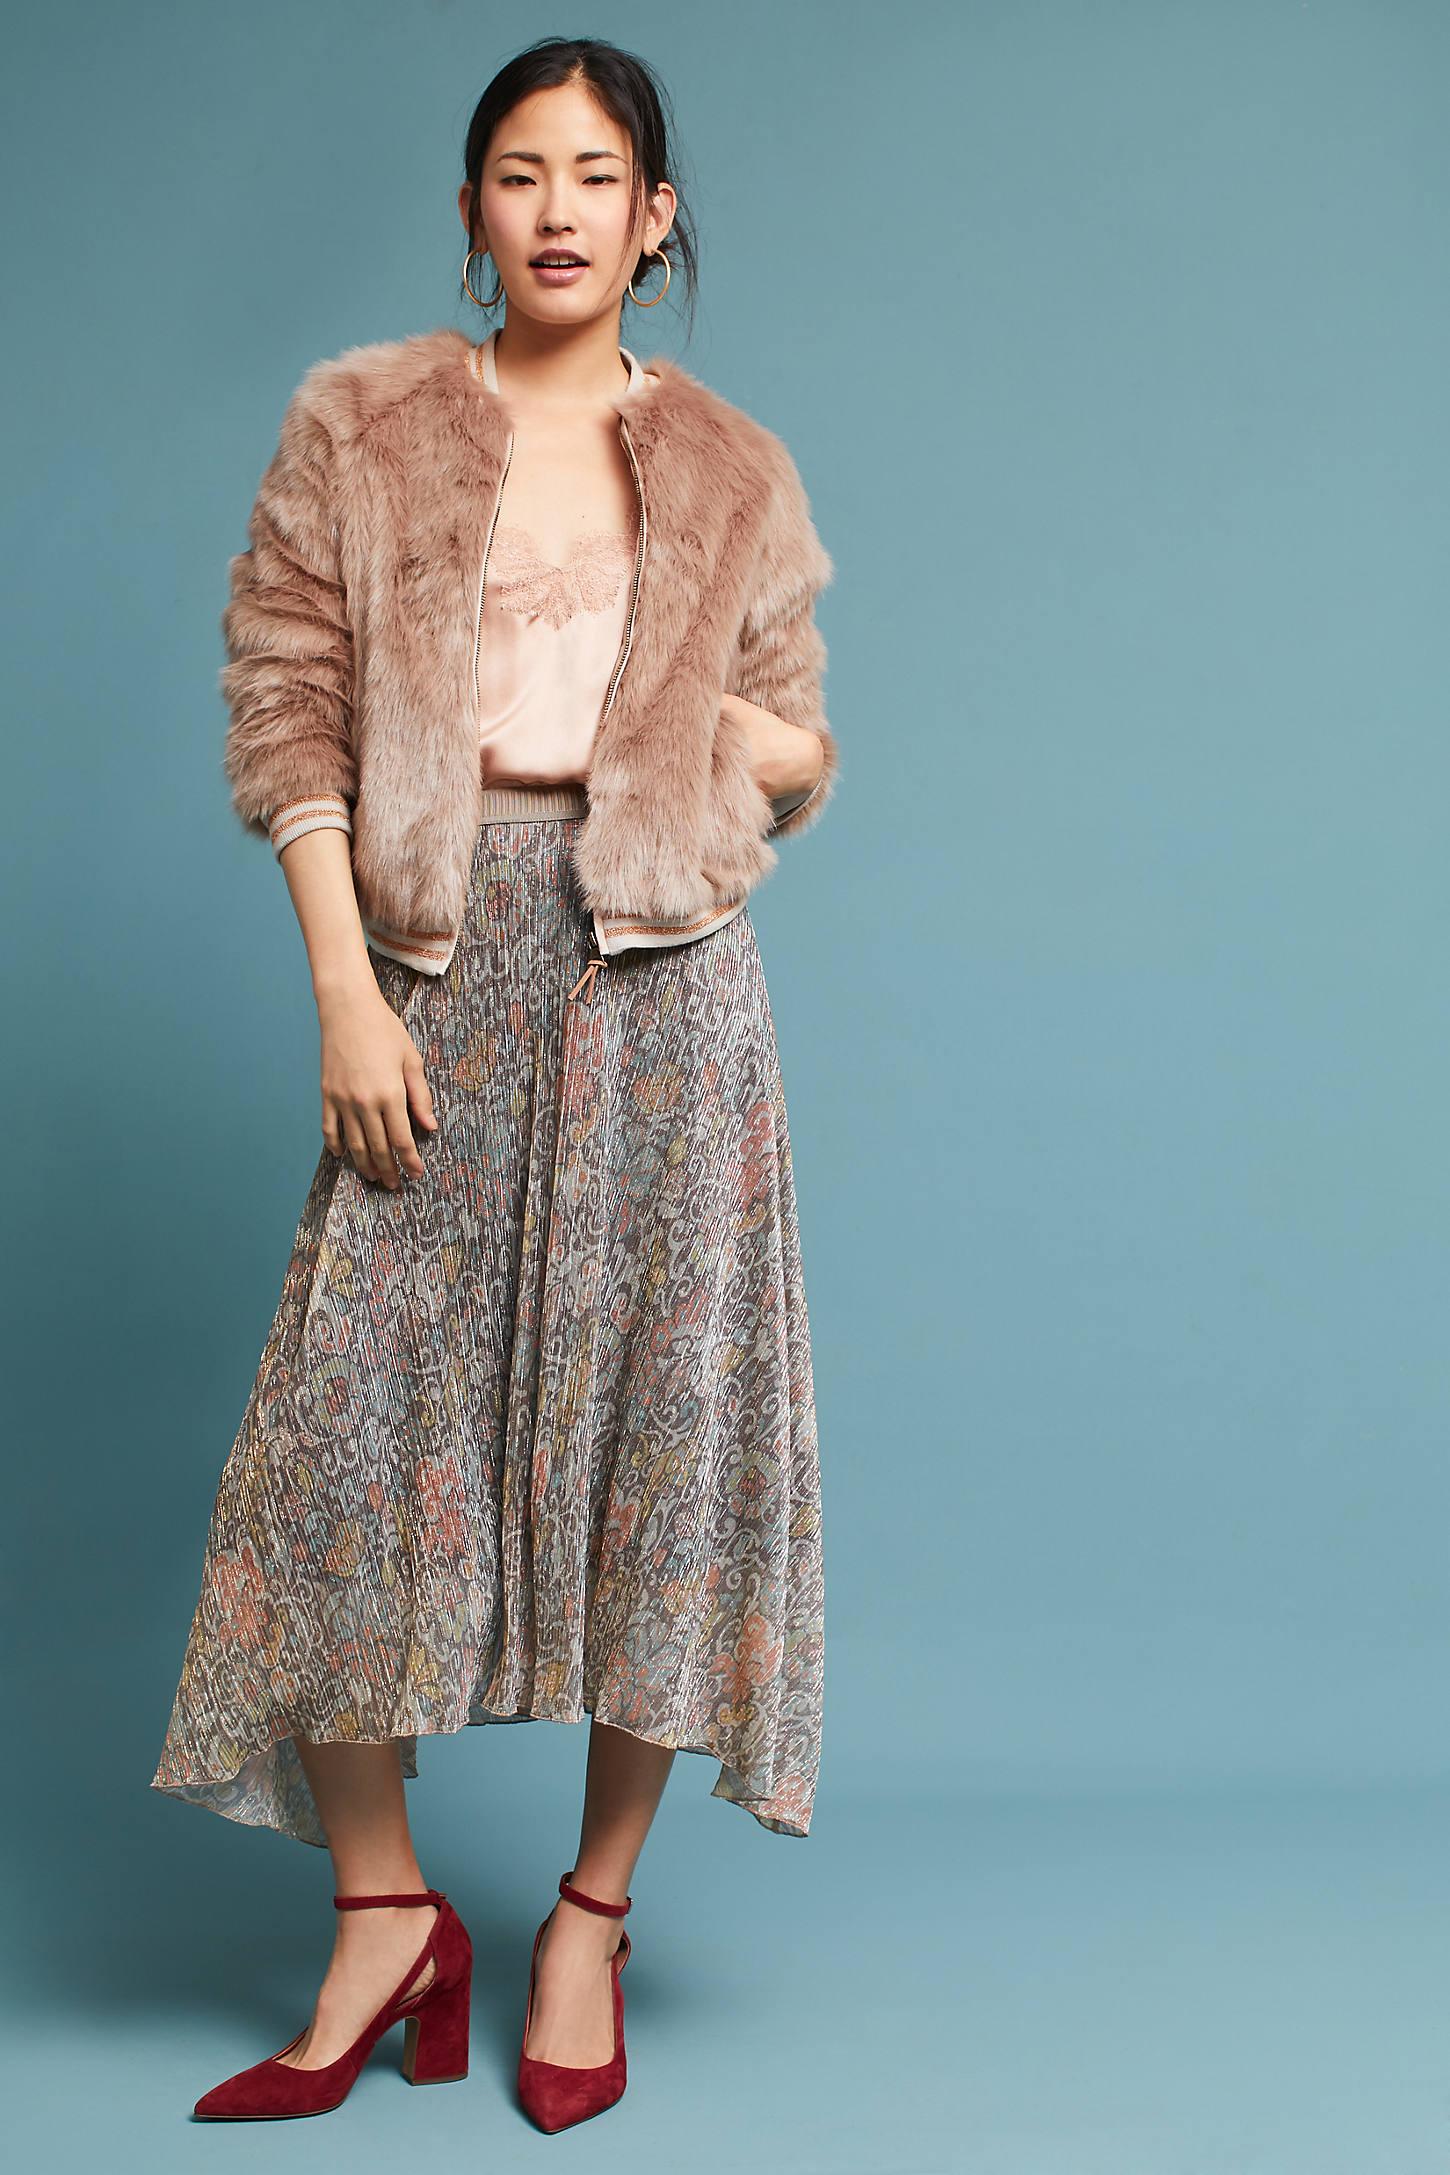 Glimmered Metallic Skirt